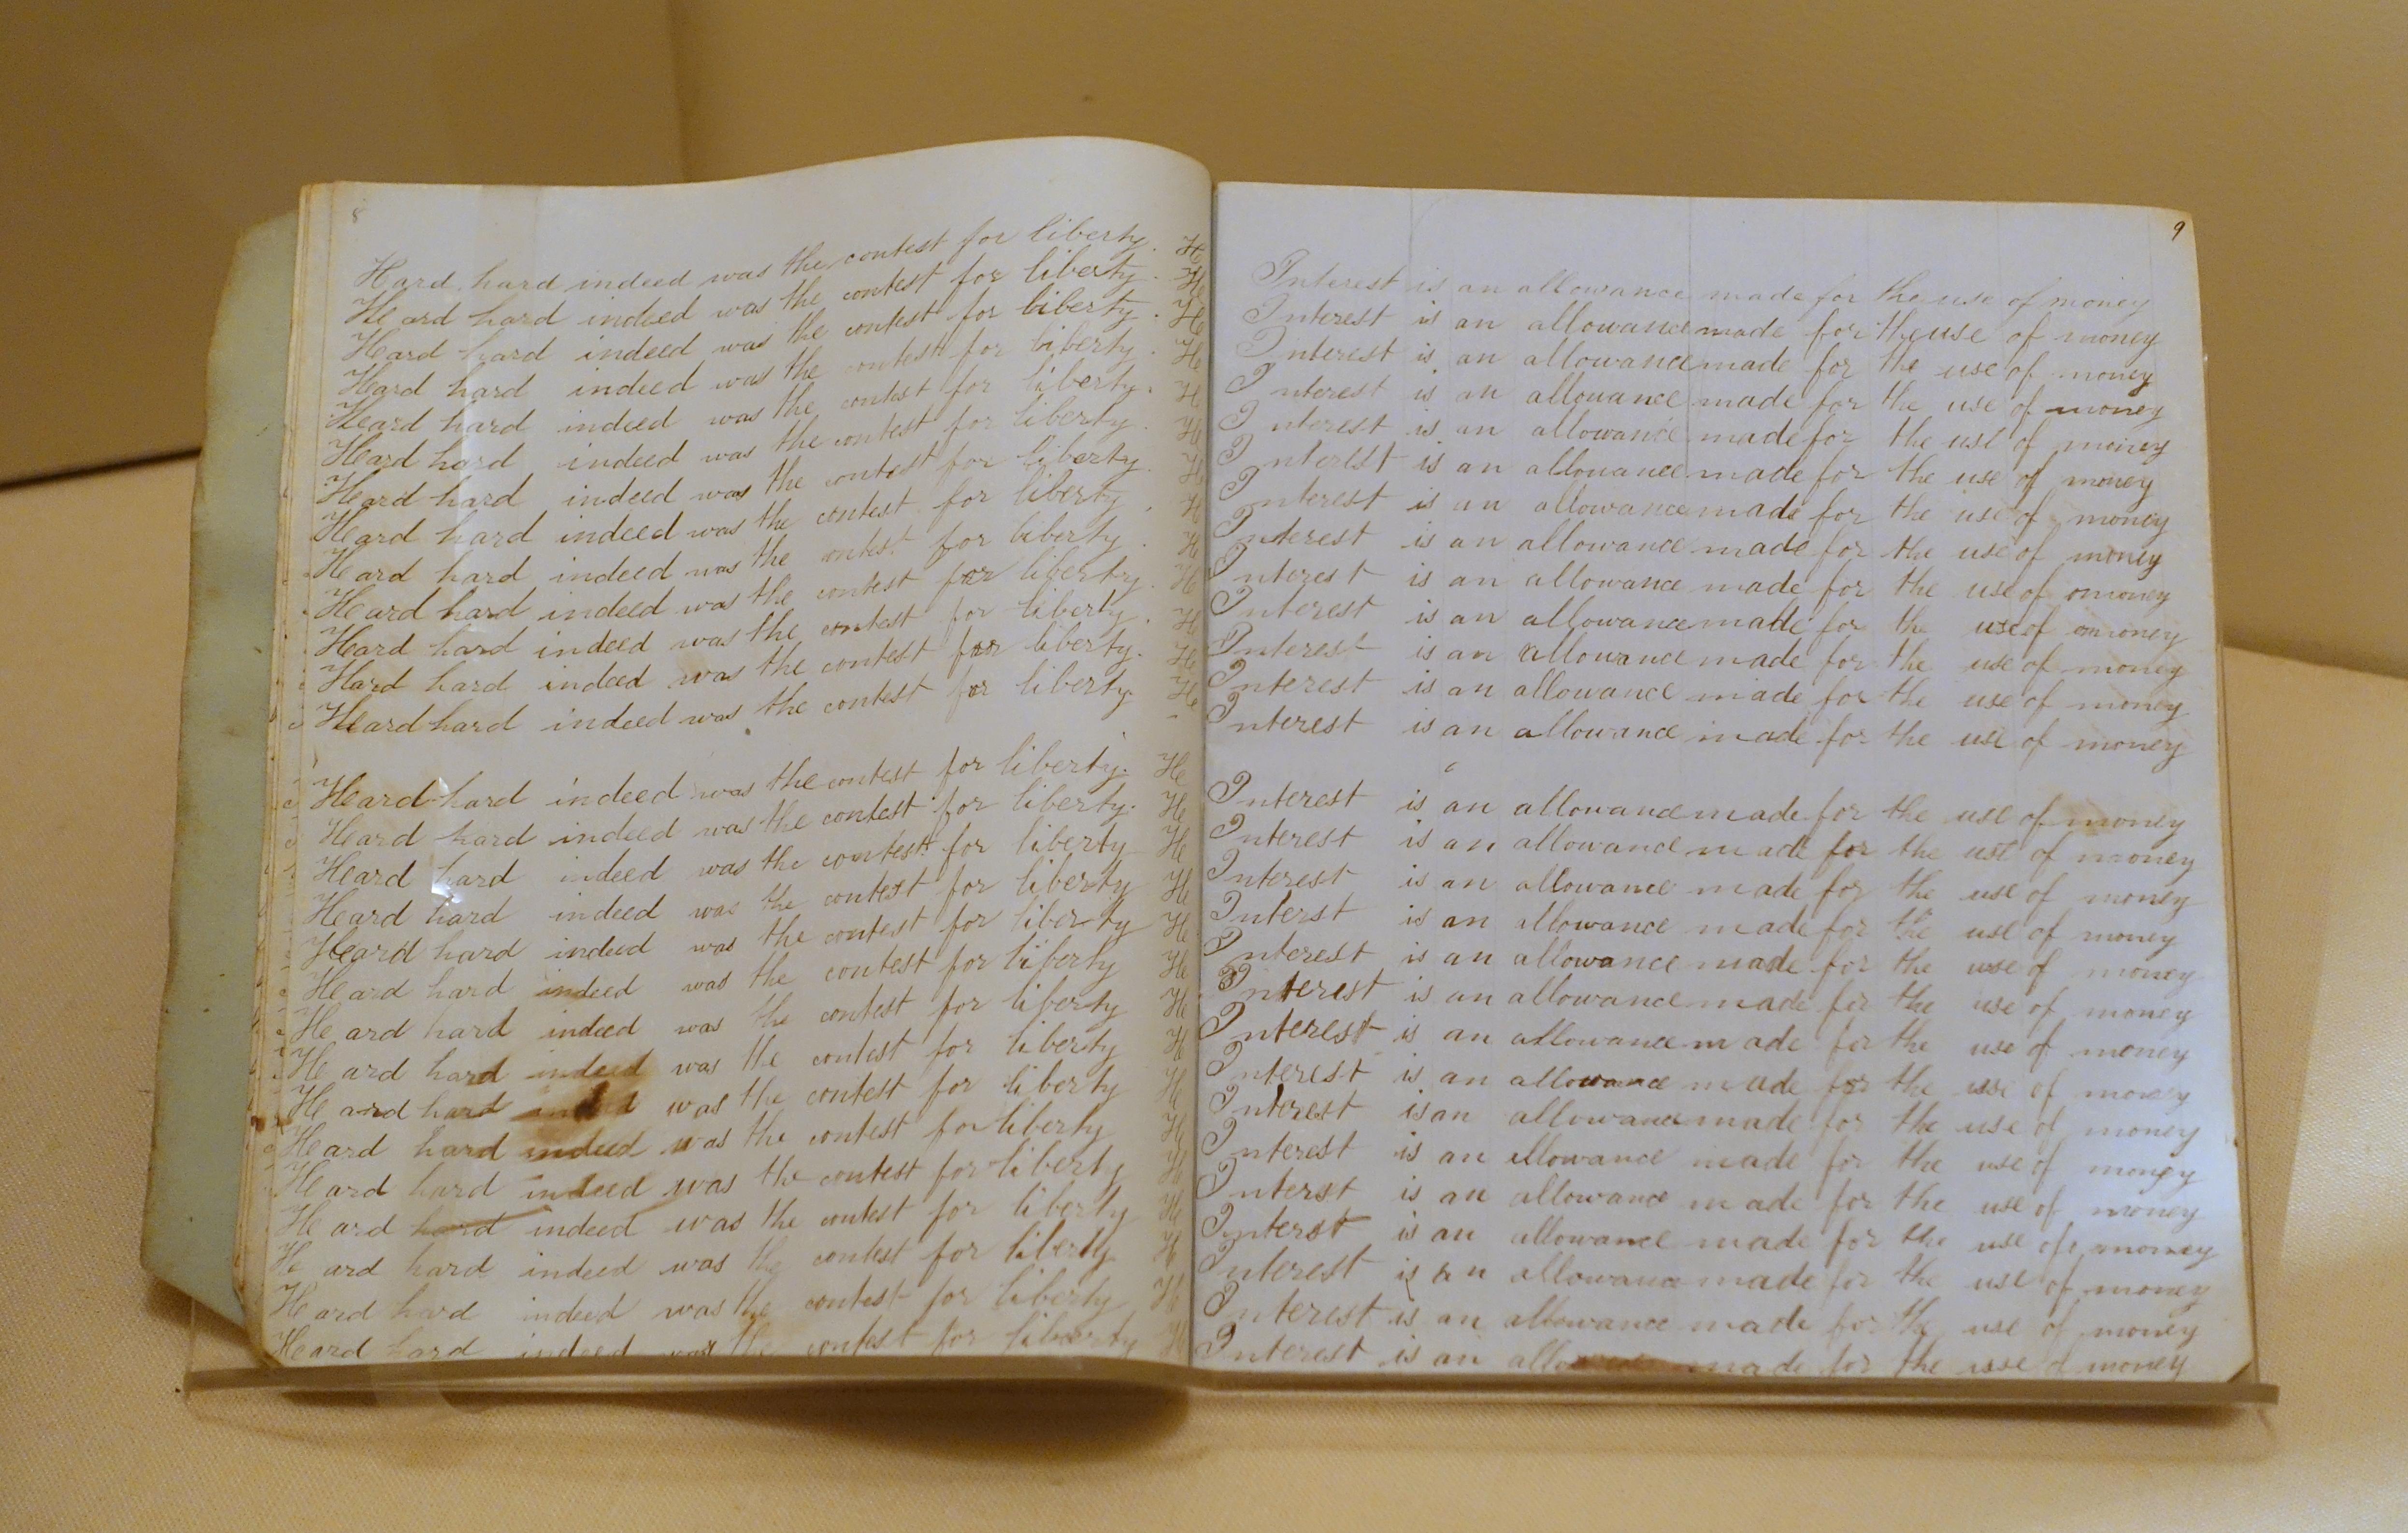 filecopy book boston 18401850 manuscript on paper